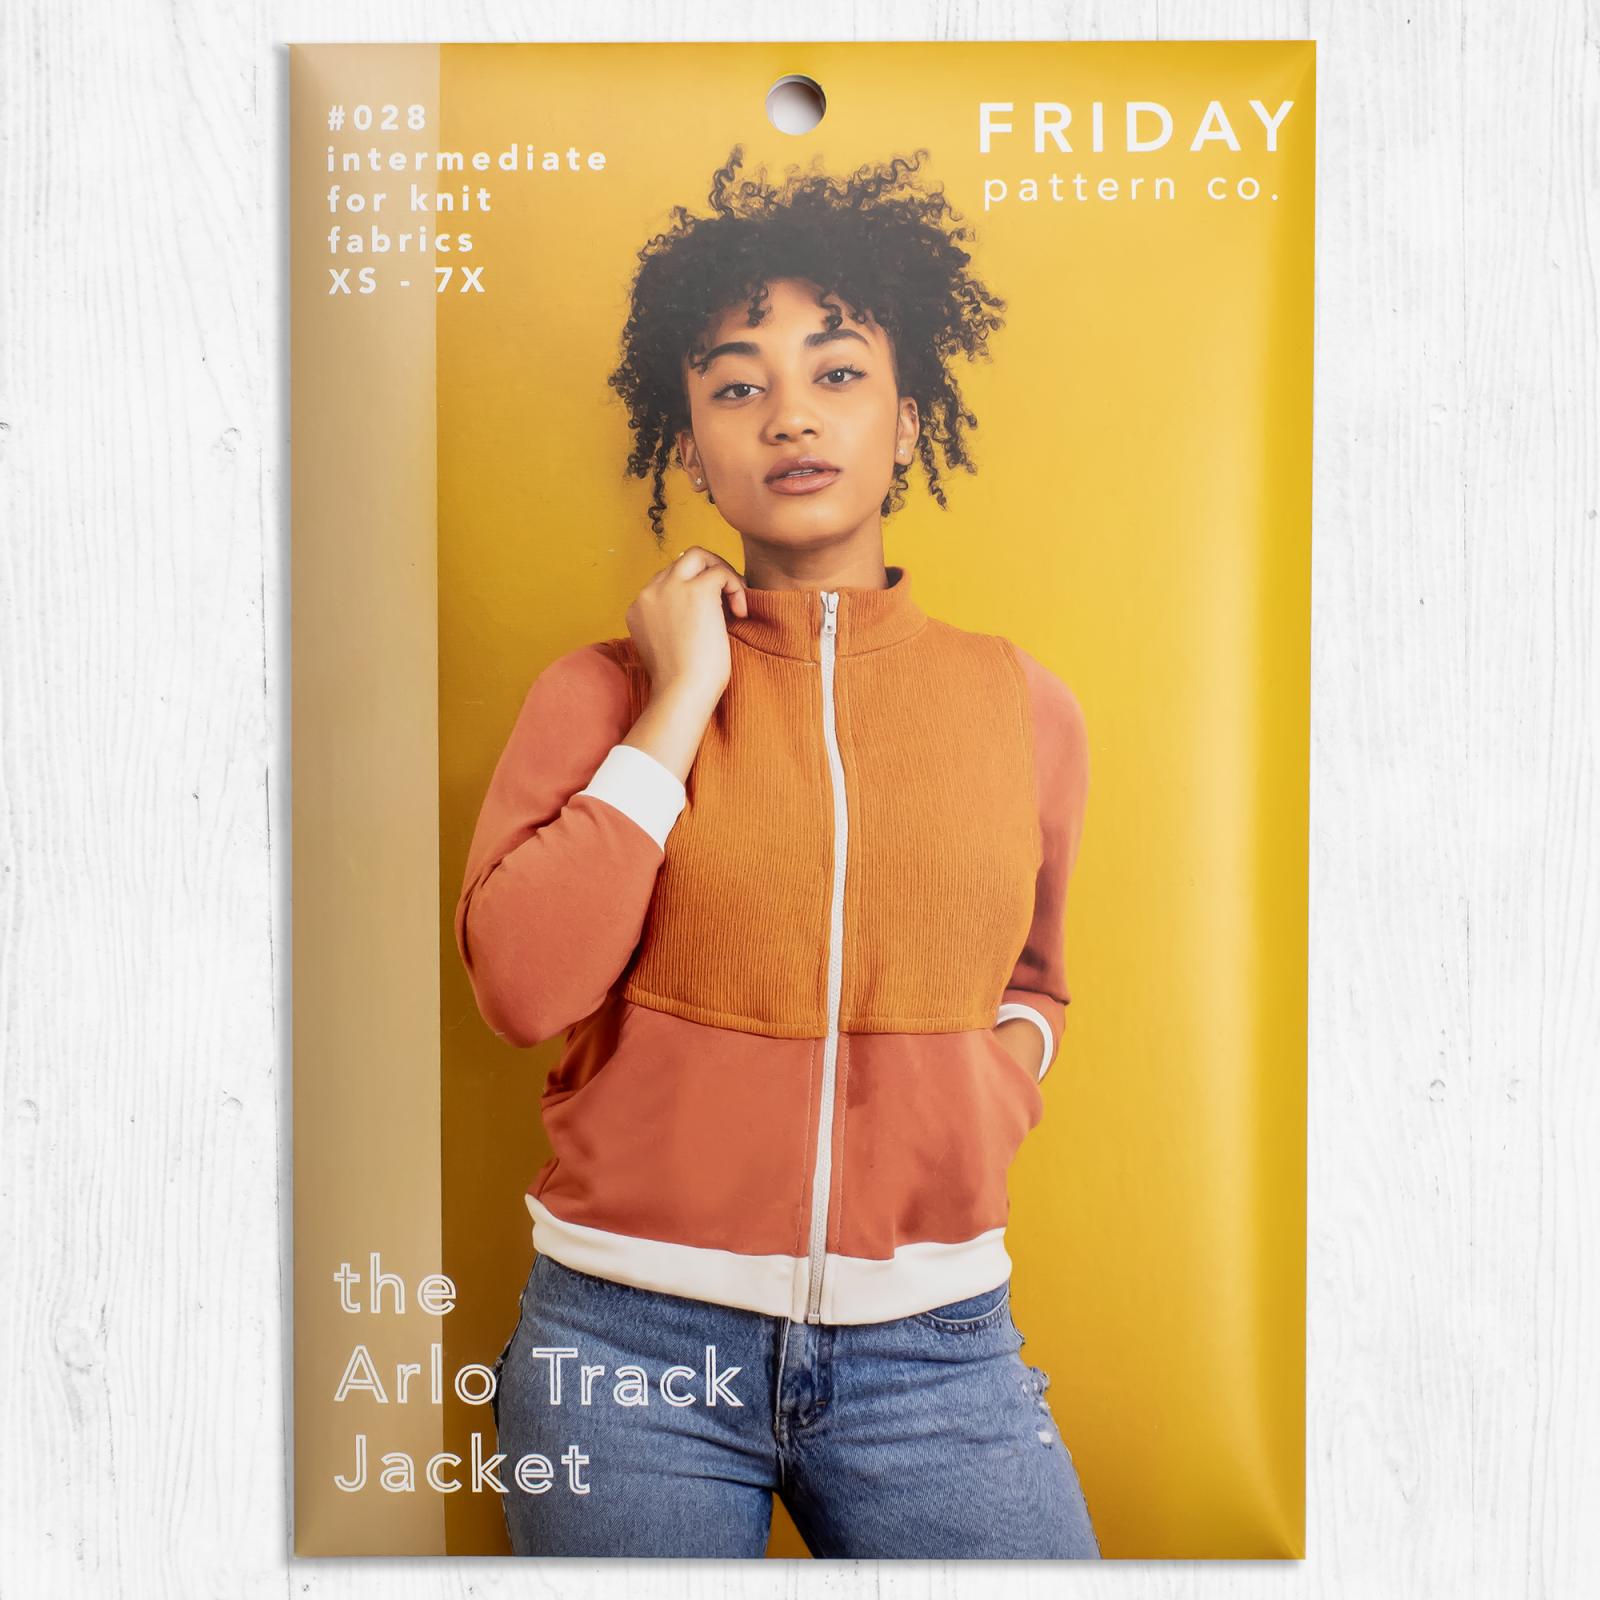 Friday Pattern Co. - The Arlo Track Jacket